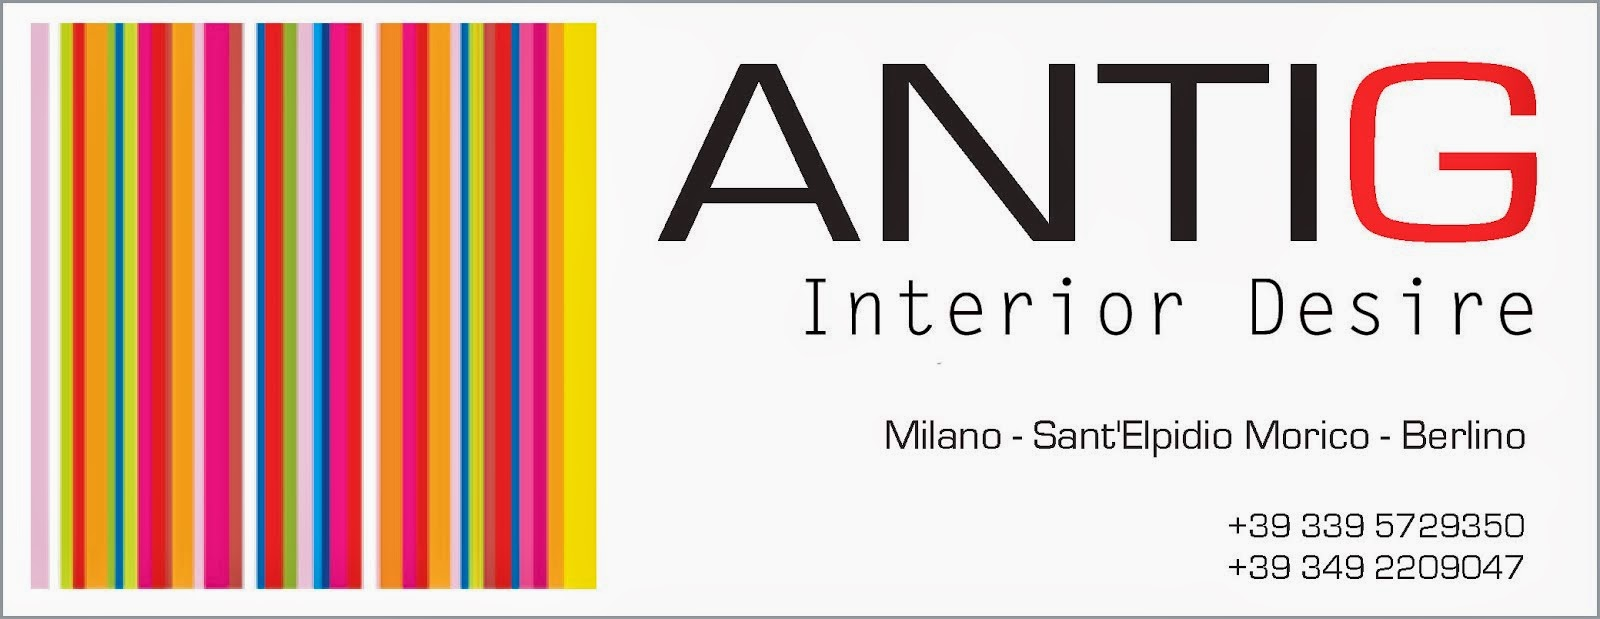 AntiG Interior Desire